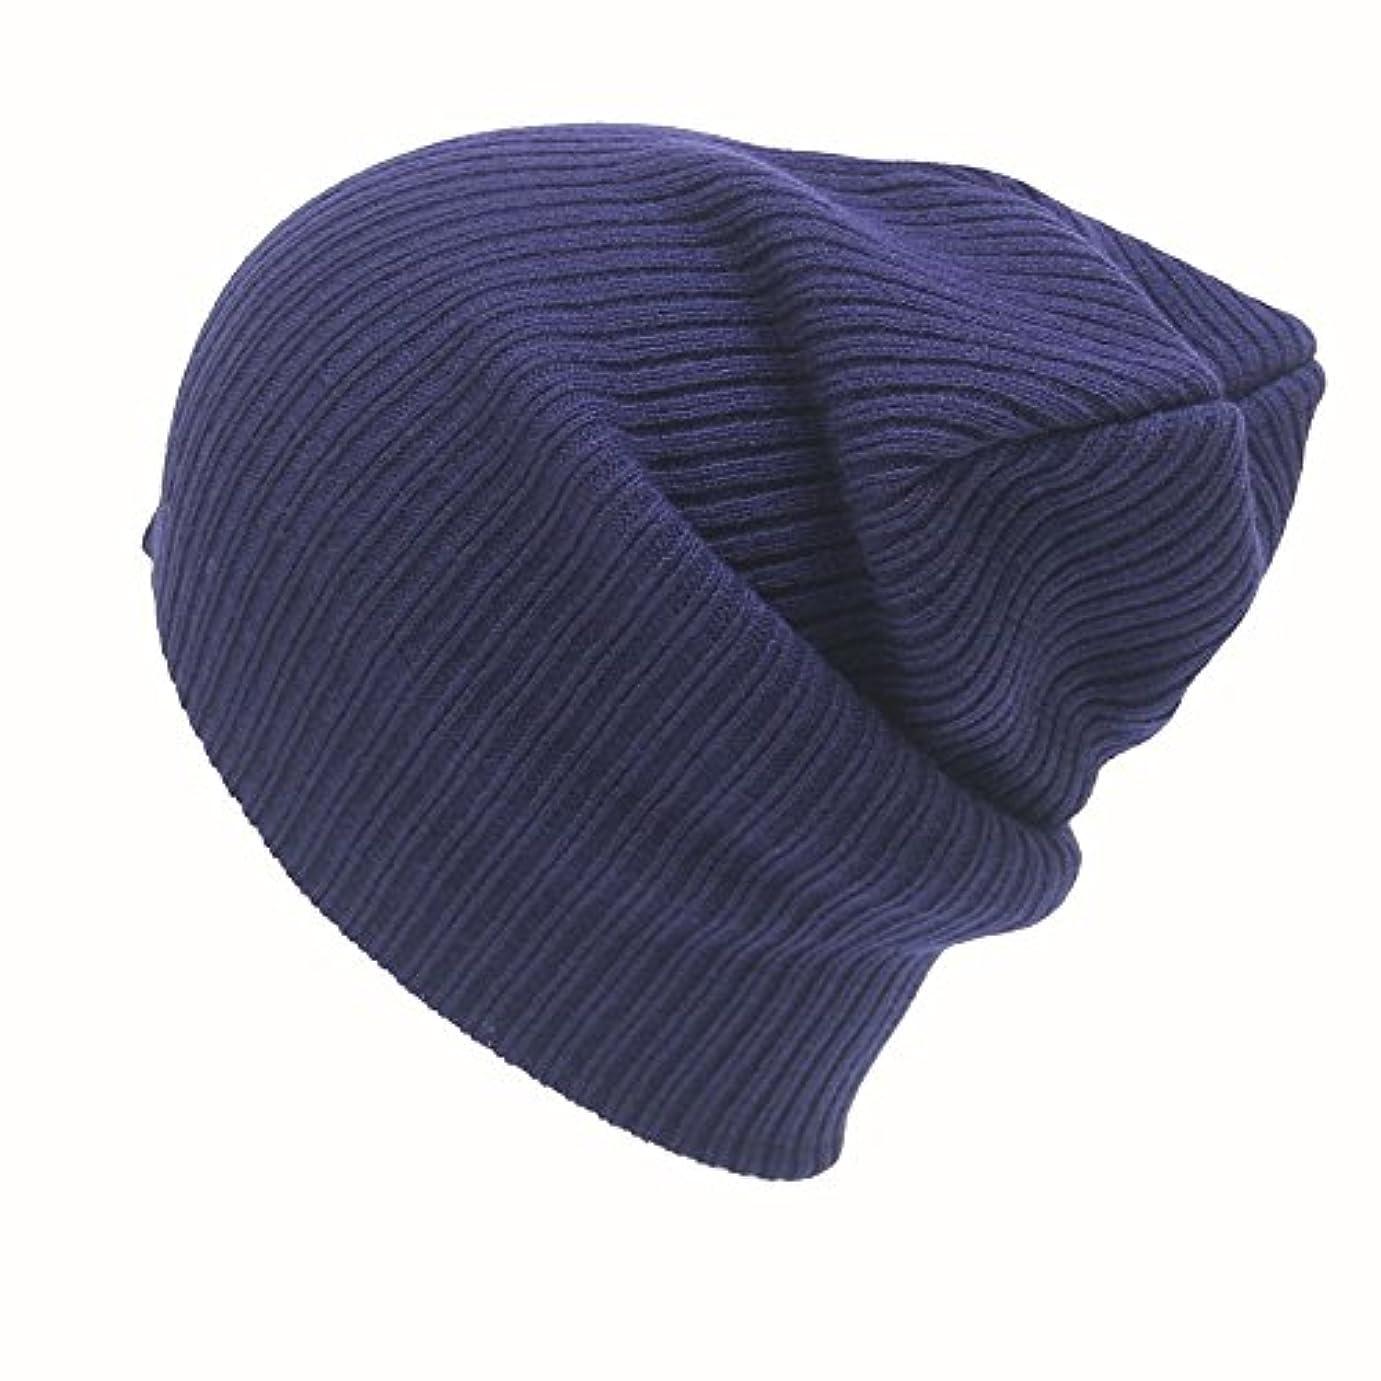 Racazing 選べる7色 ニット帽 編み物 ストライプ ニット帽 防寒対策 通気性のある 防風 暖かい 軽量 屋外 スキー 自転車 クリスマス Hat 男女兼用 (ネービー)